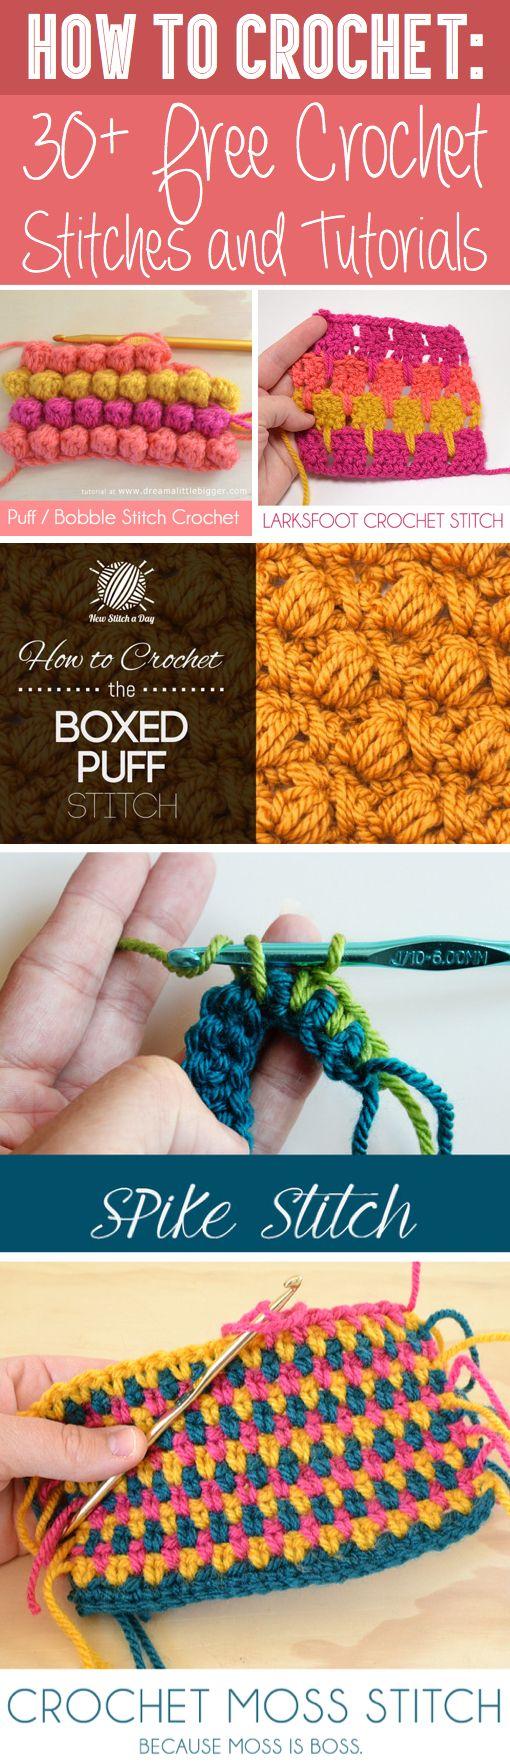 How To Crochet: 30+ Free Crochet Stitches and Tutorials ༺✿ƬⱤღ https://www.pinterest.com/teretegui/✿༻